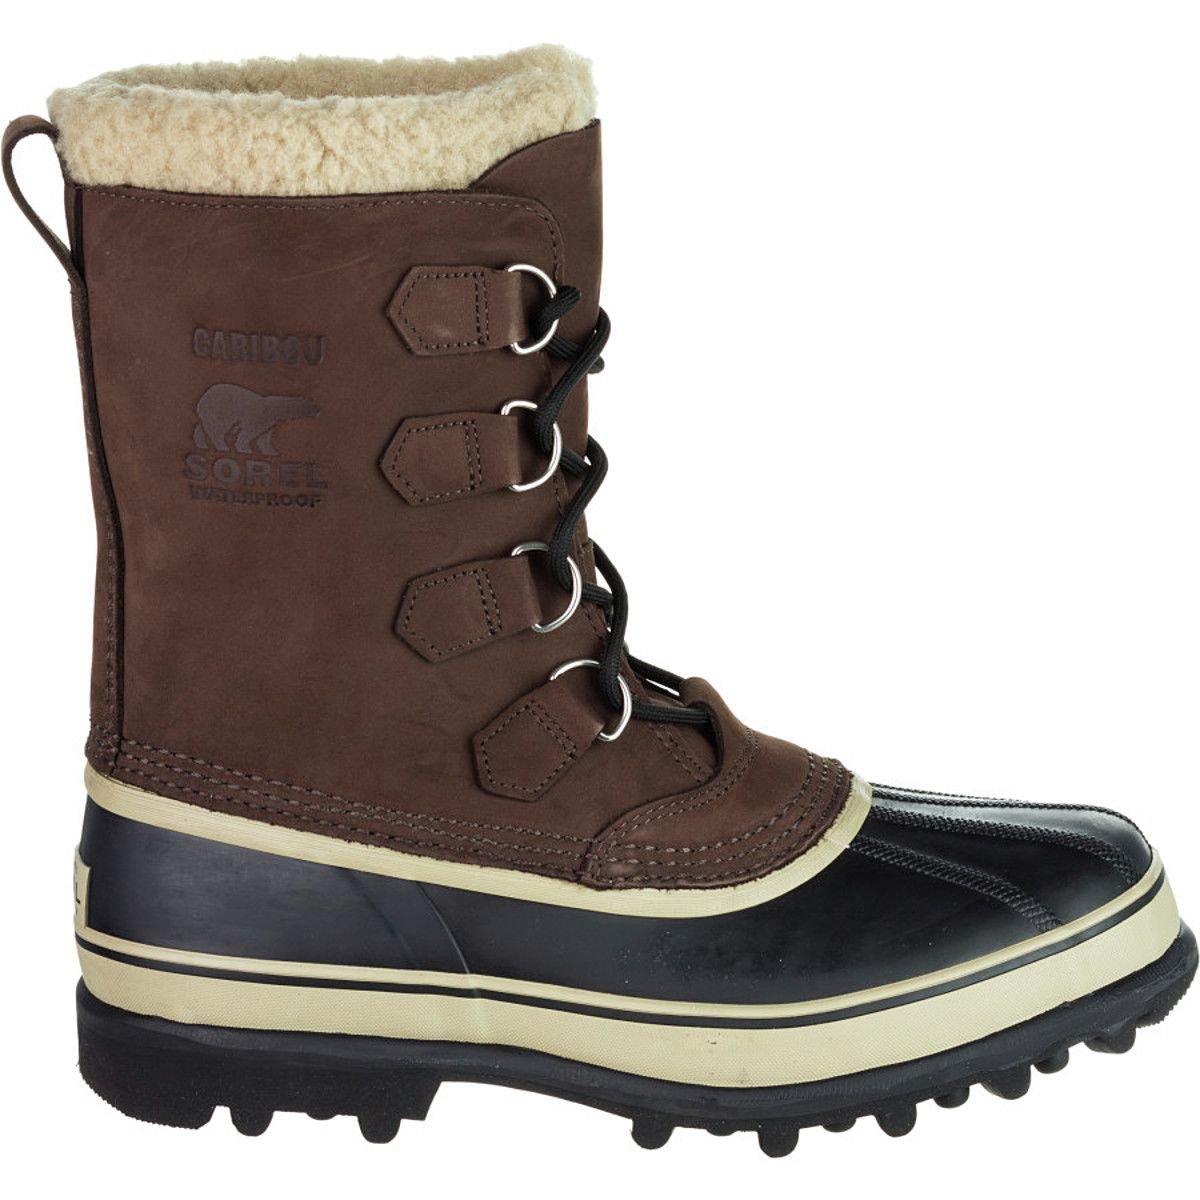 Sorel Caribou Boot - Men's Bruno 15 by SOREL